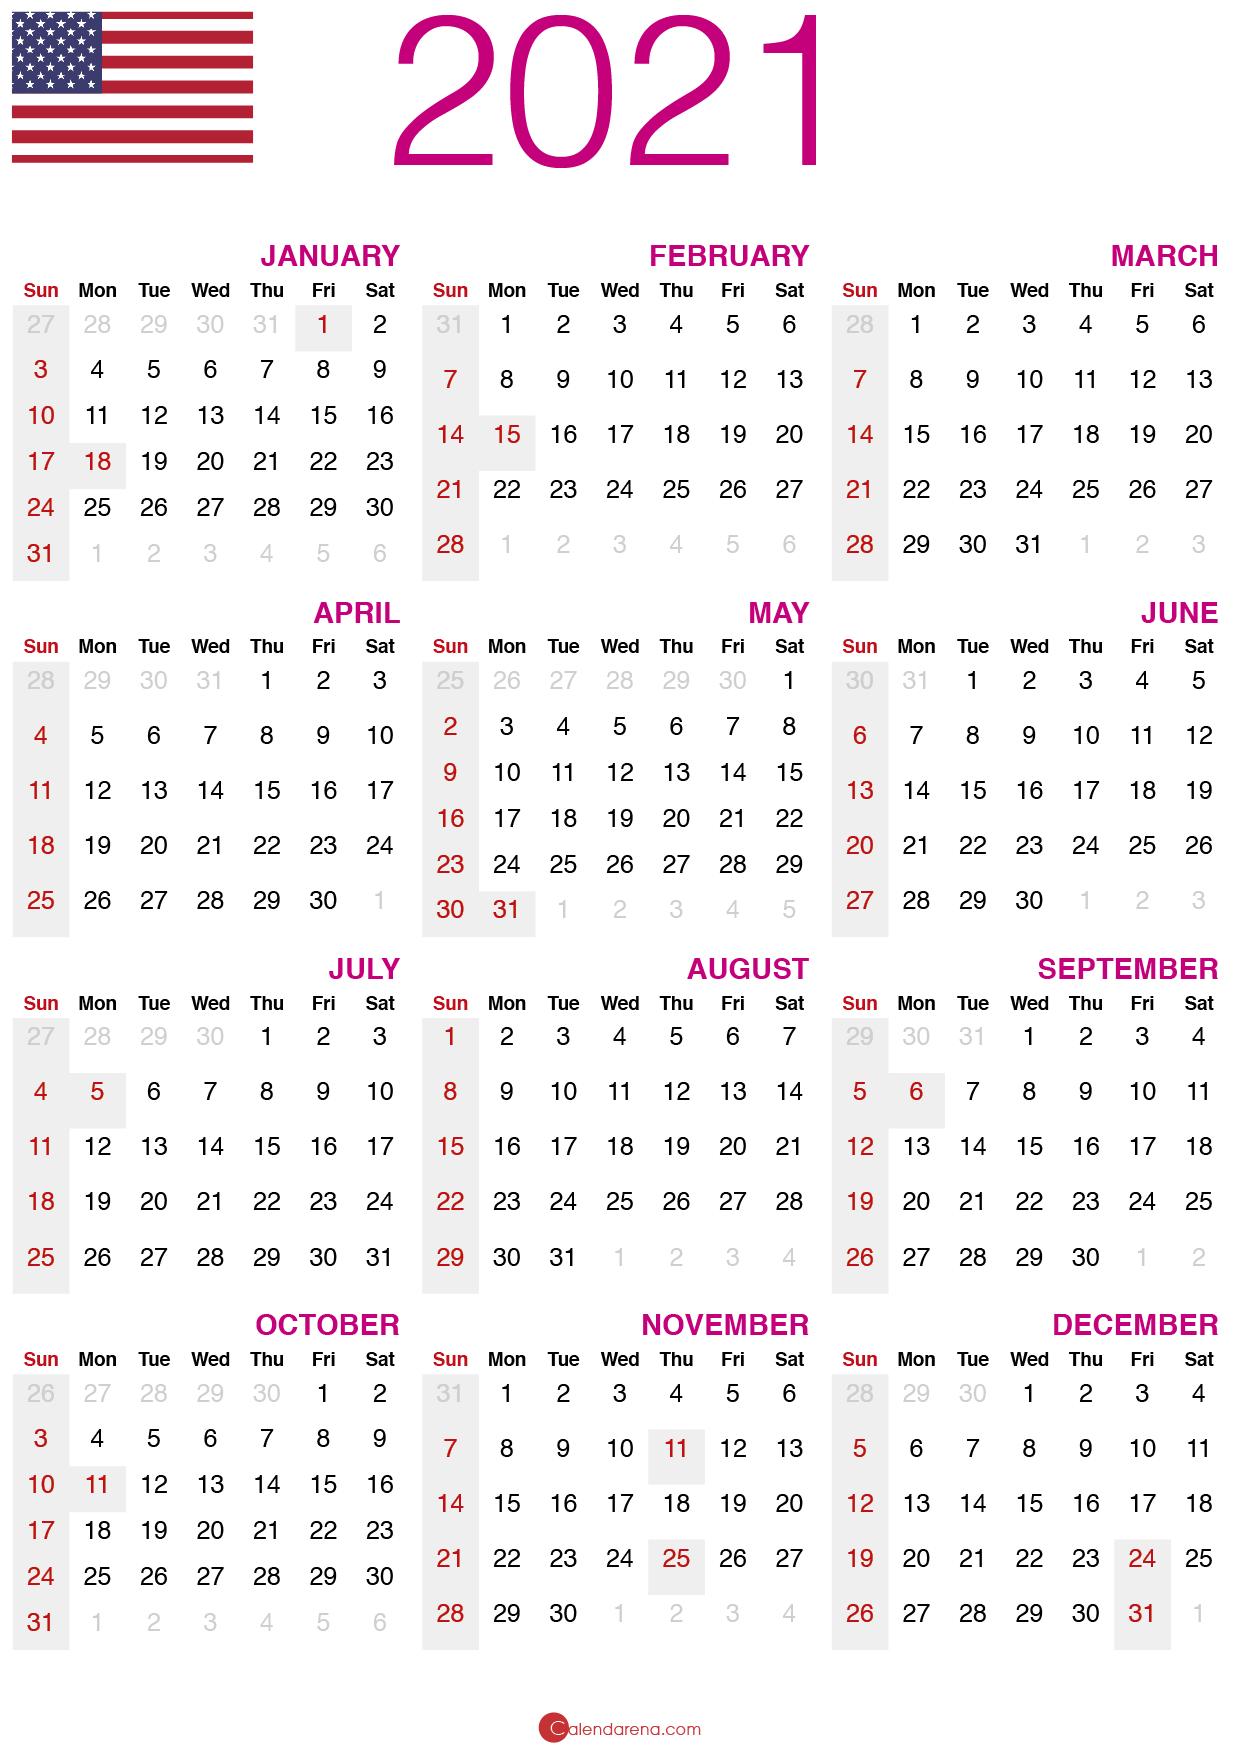 Download Free Printable Calendar 2021 F09f87baf09f87b8